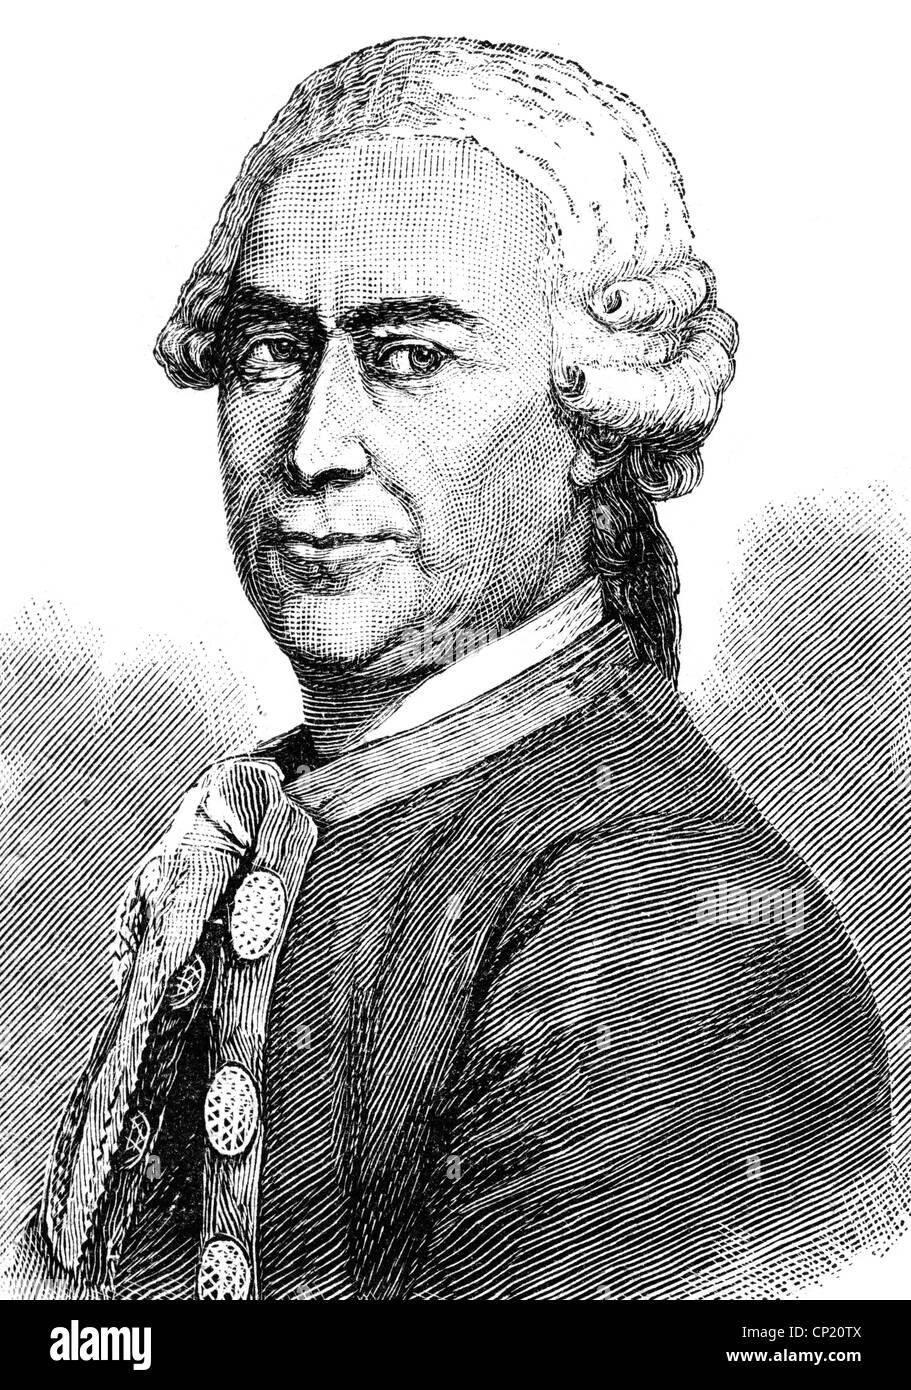 Tassaert, Jean-Pierre-Antoine, circa 1727 - 21.1.1788, French sculptor, portrait, wood engraving, 19th century, - Stock Image